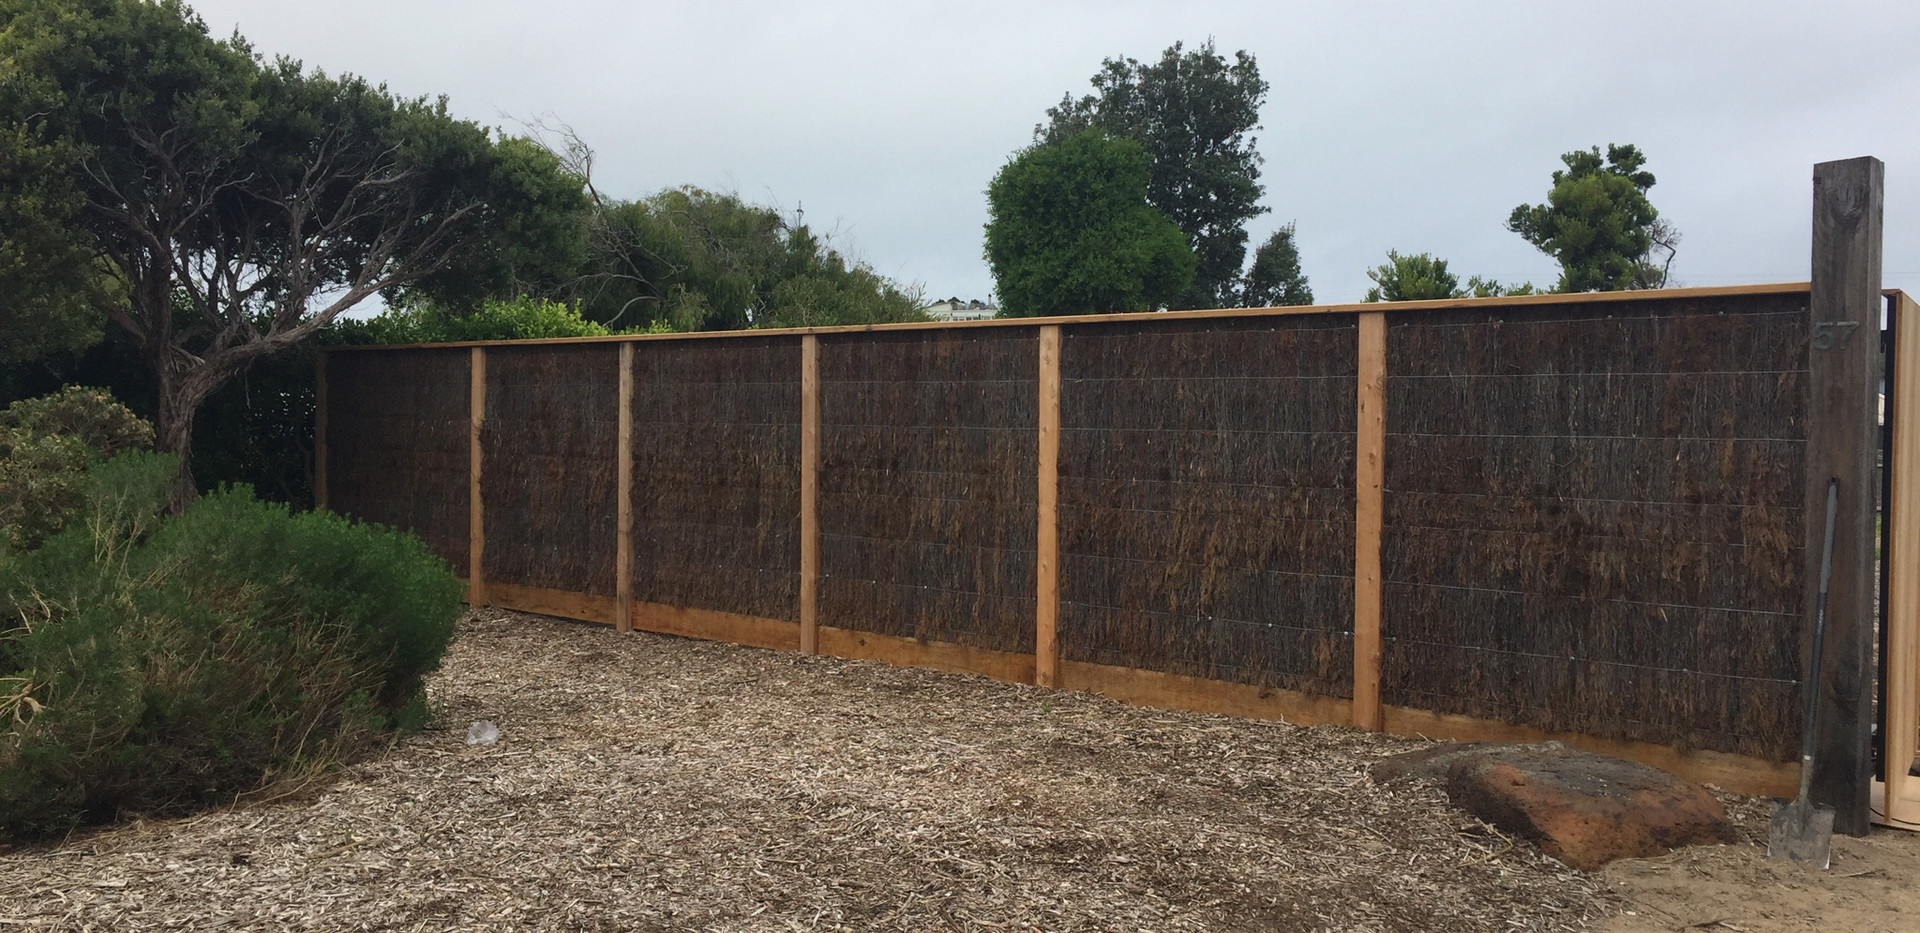 brush fencing Mornington Peninsula Fences